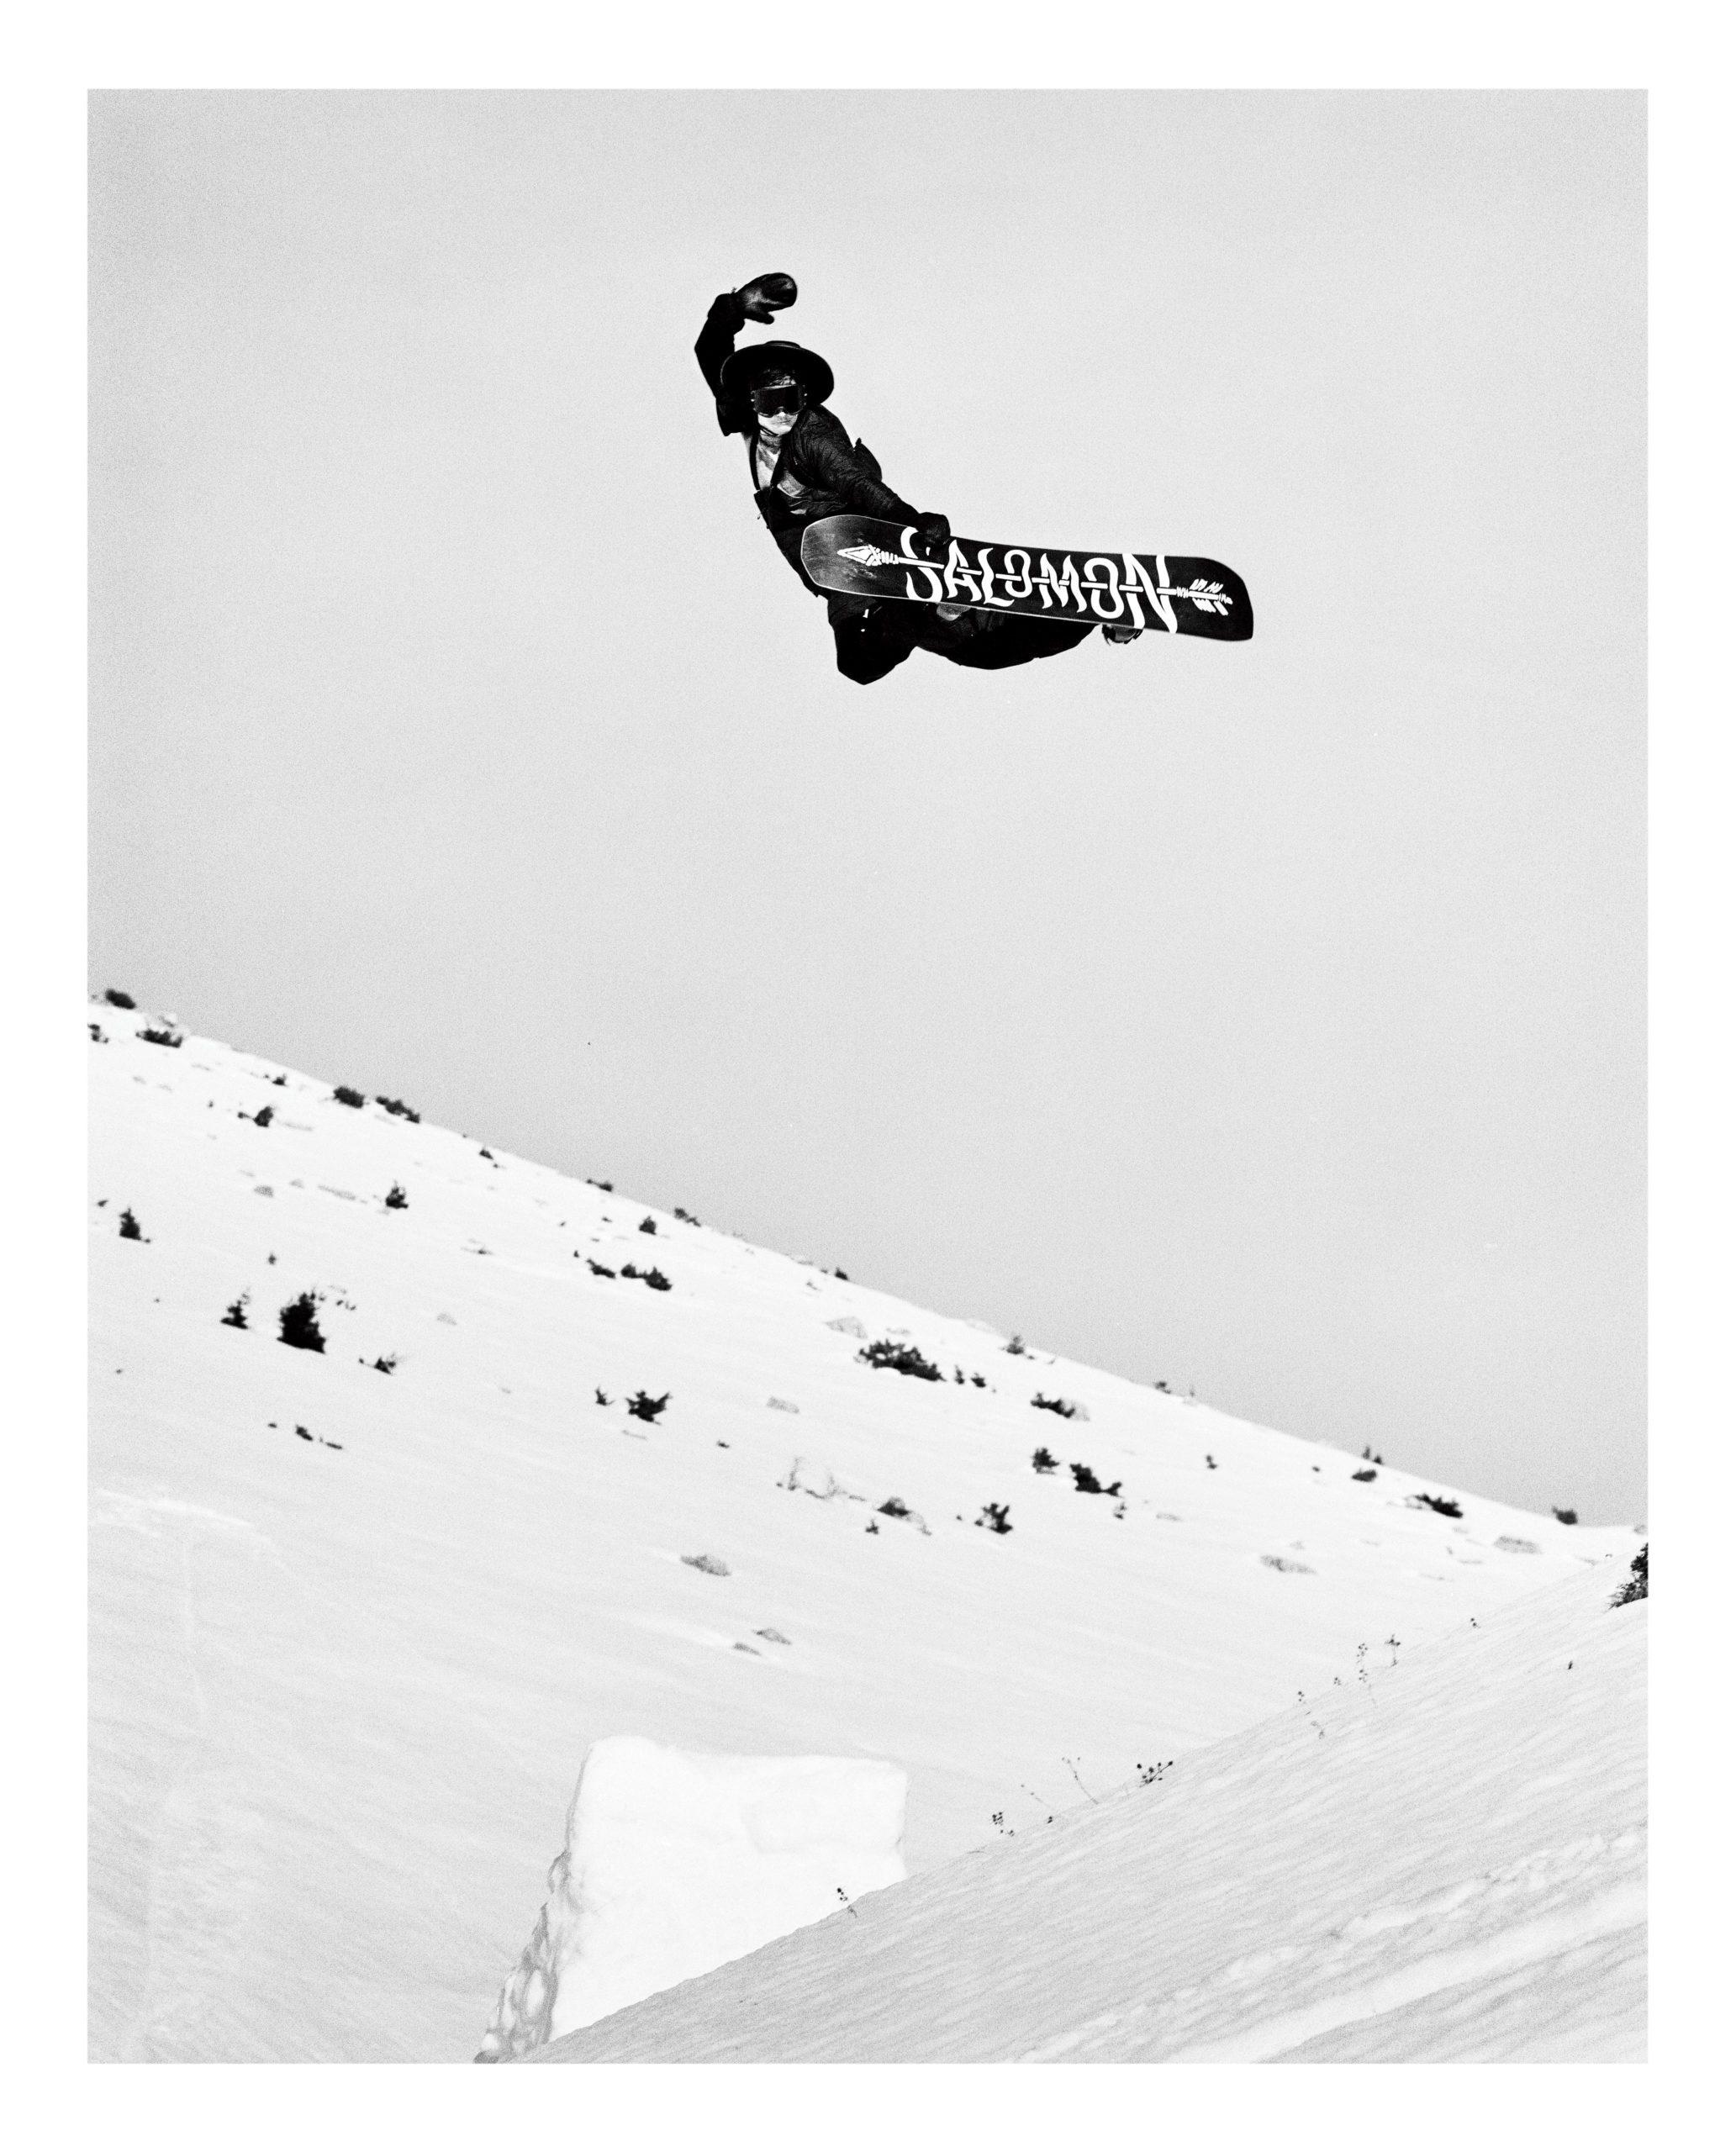 Victor Daviet snowboarding in greece